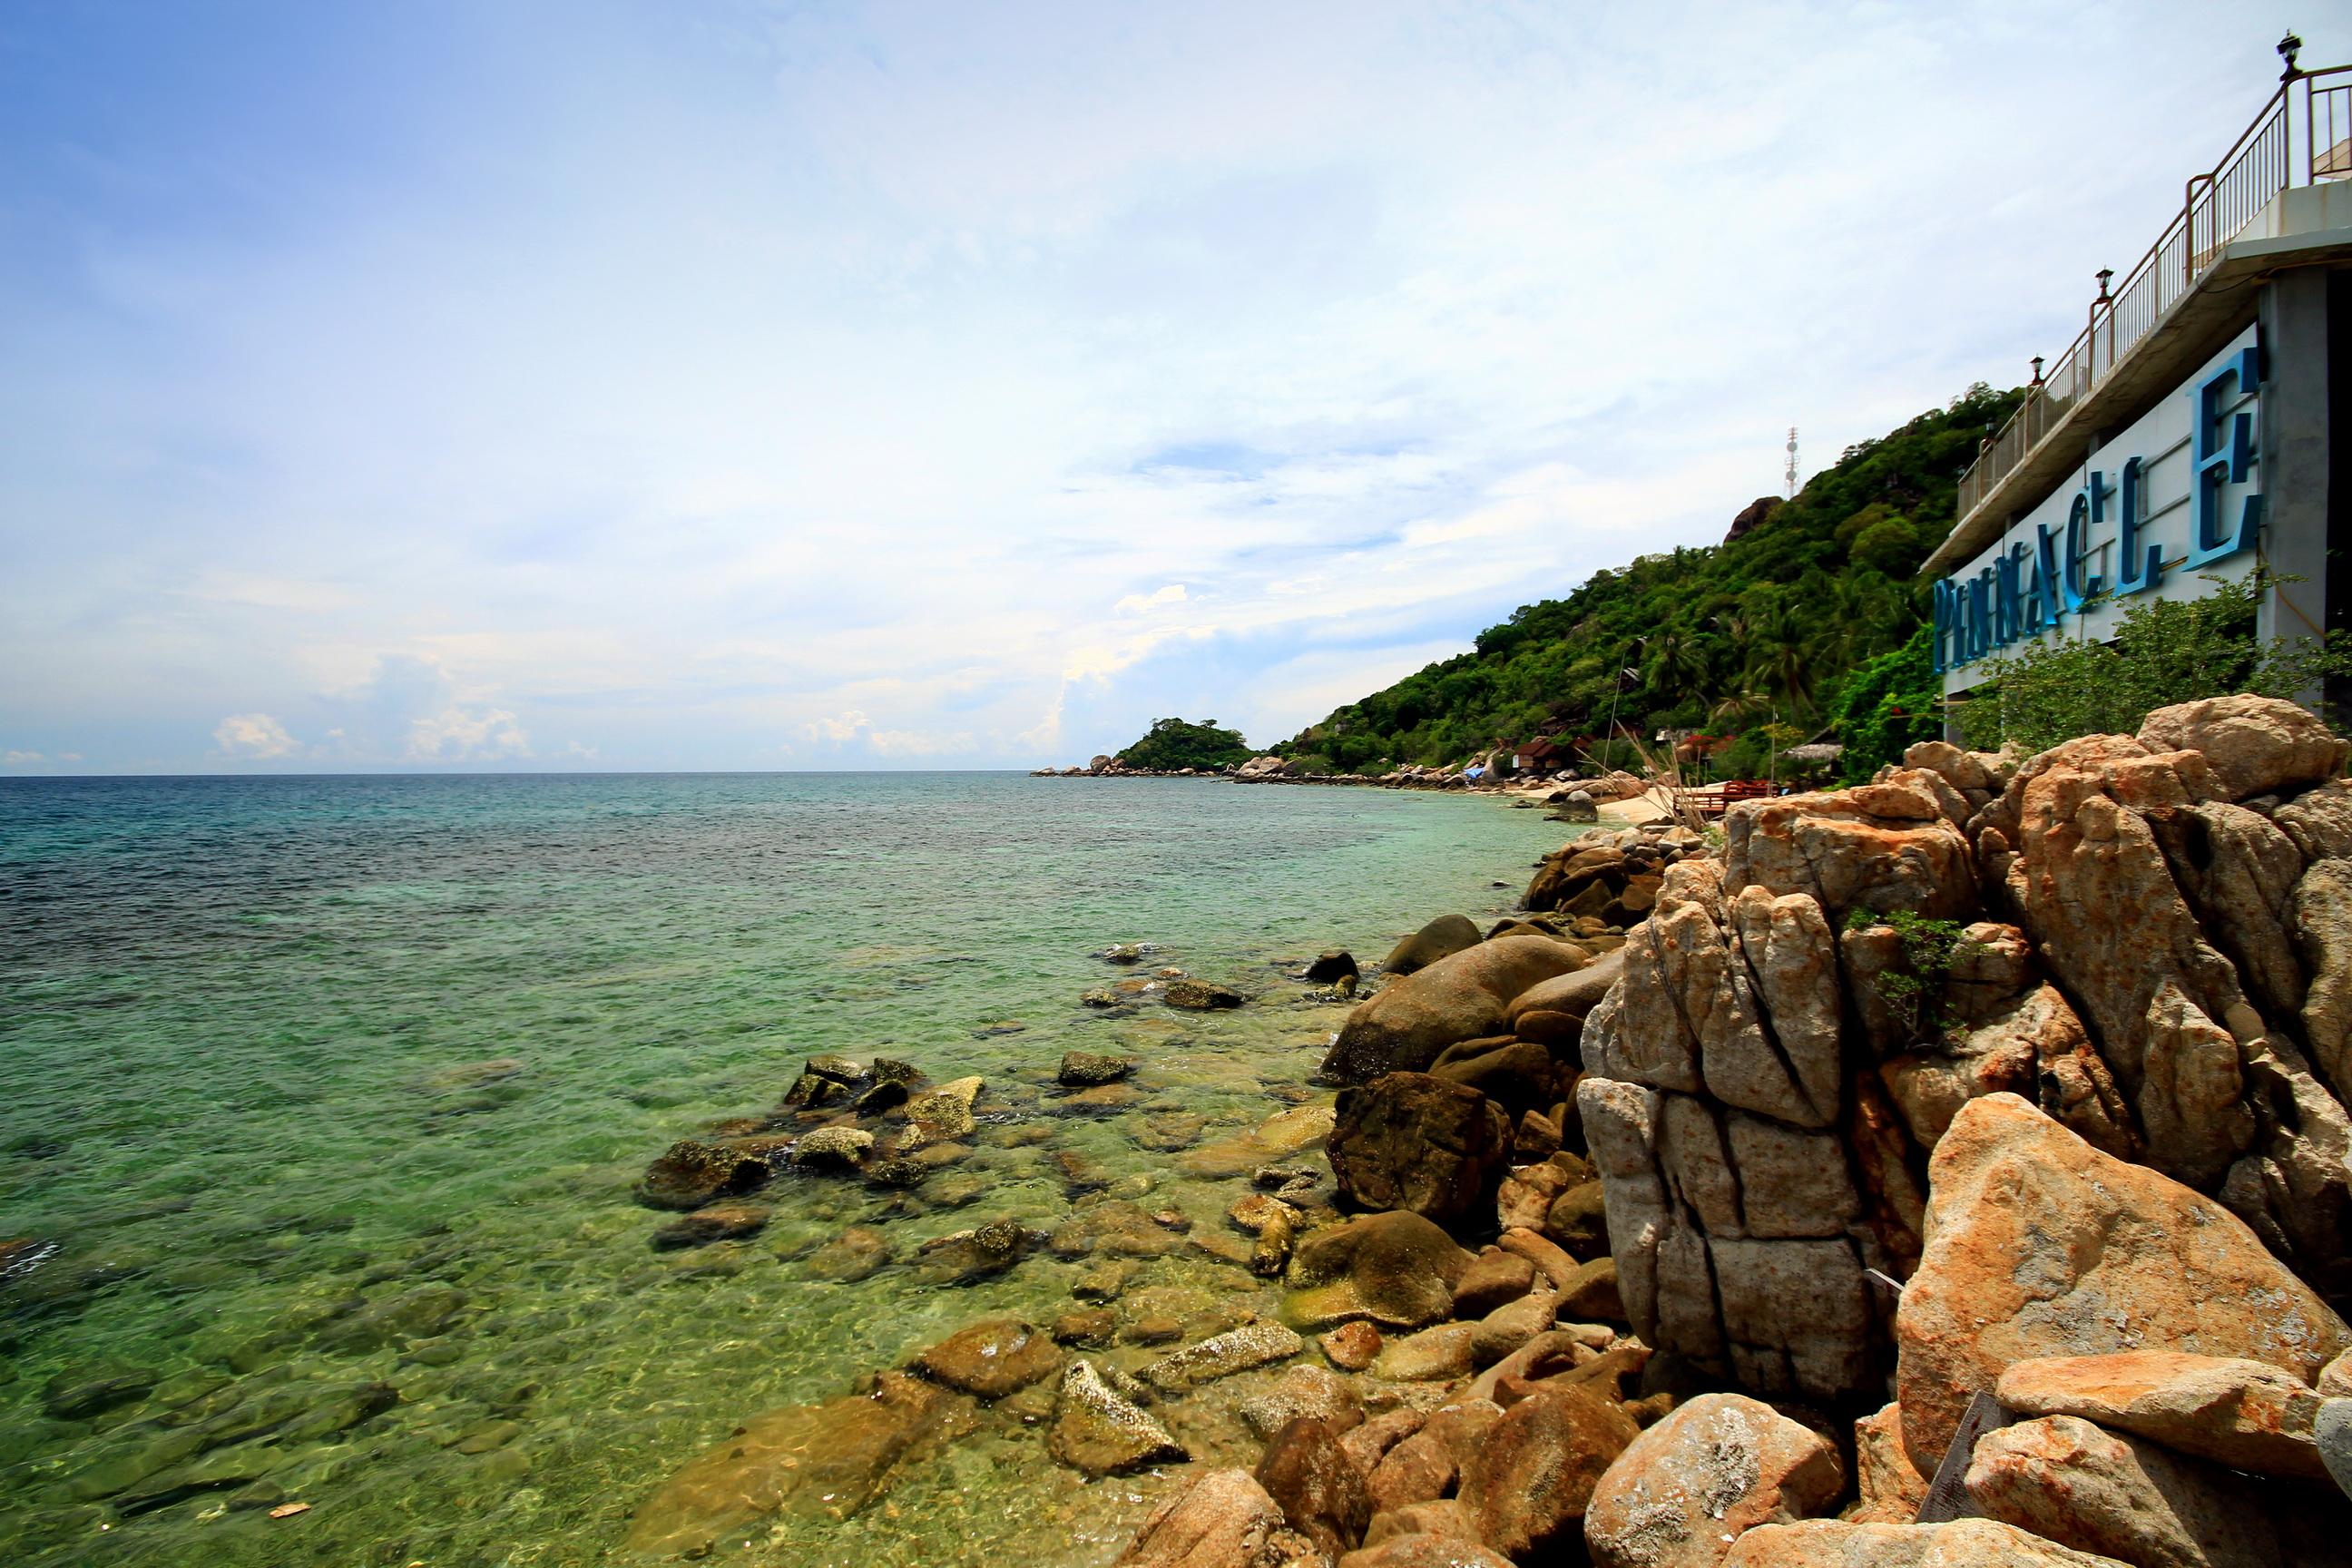 Thajsko pinnacle koh tao dive resort dovolen a ubytov n v thajsku - Ko tao dive resort ...